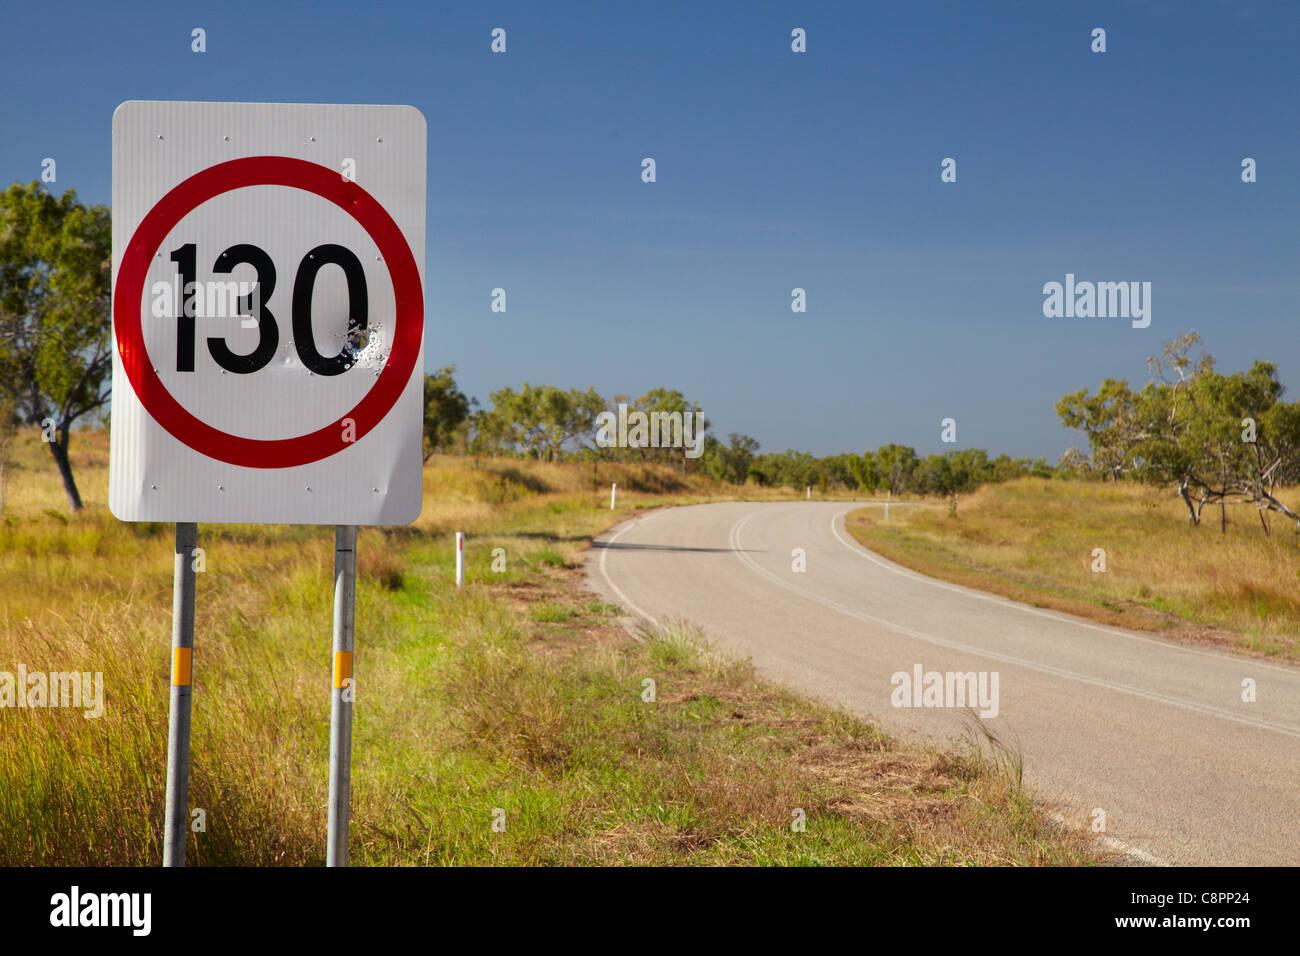 130km speed sign, Victoria Highway, Northern Territory, Australia - Stock Image